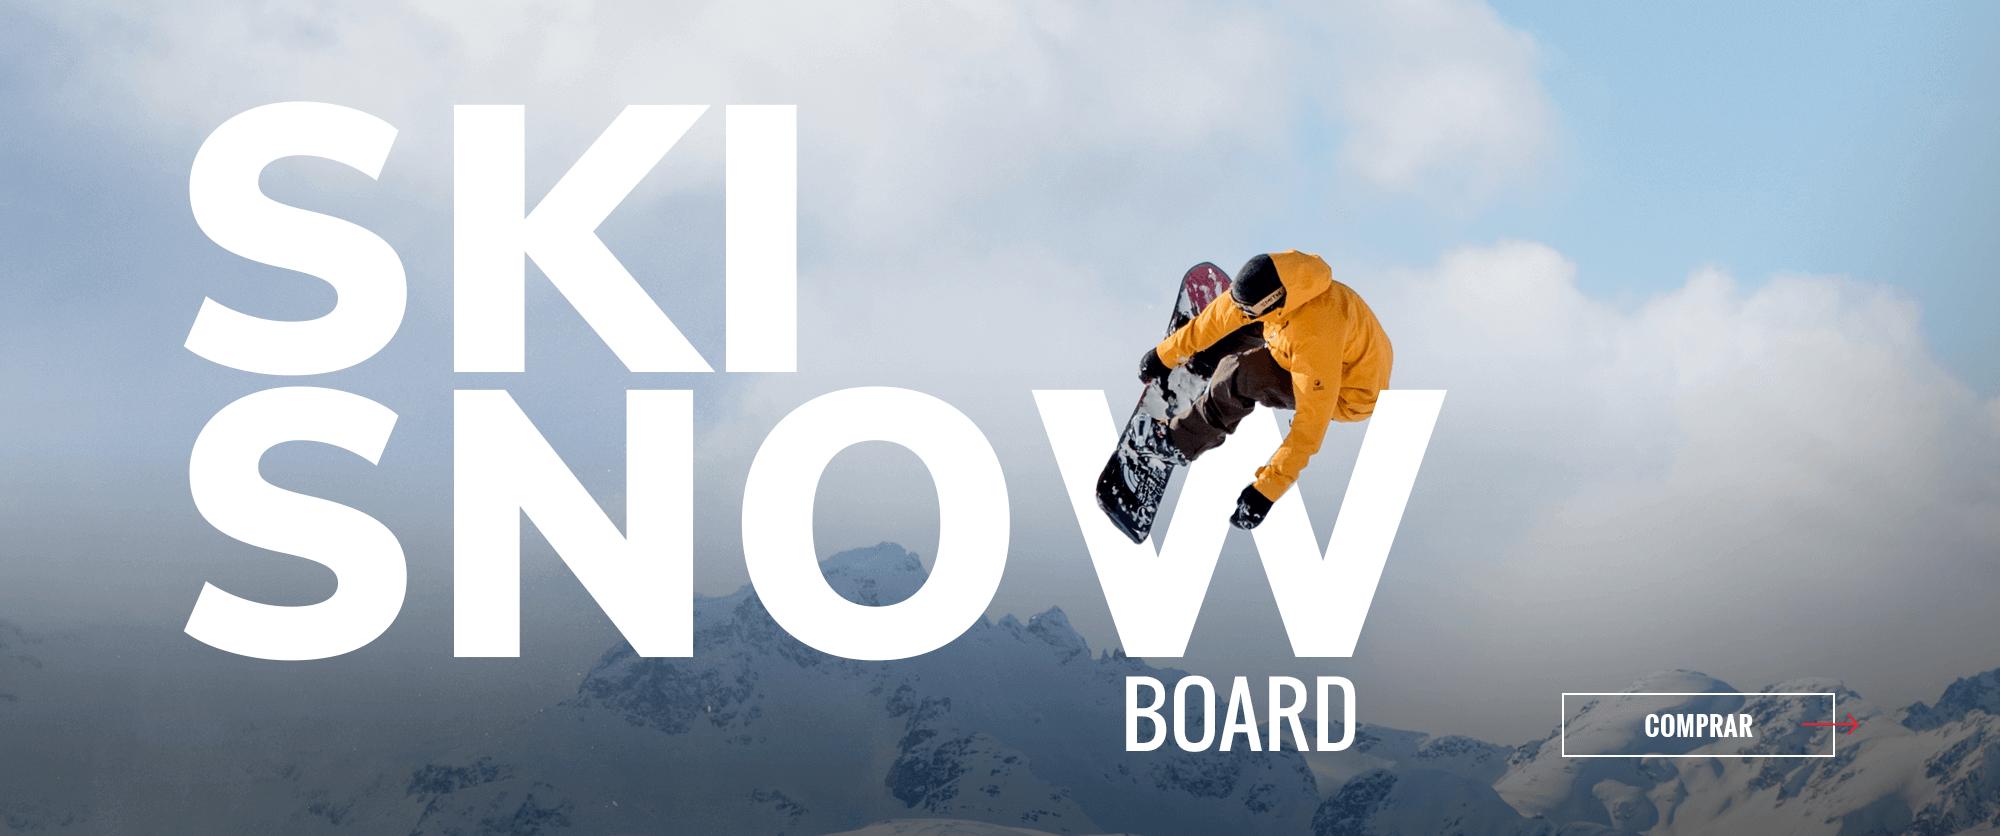 banner-principal-2-20171031-skie-snow